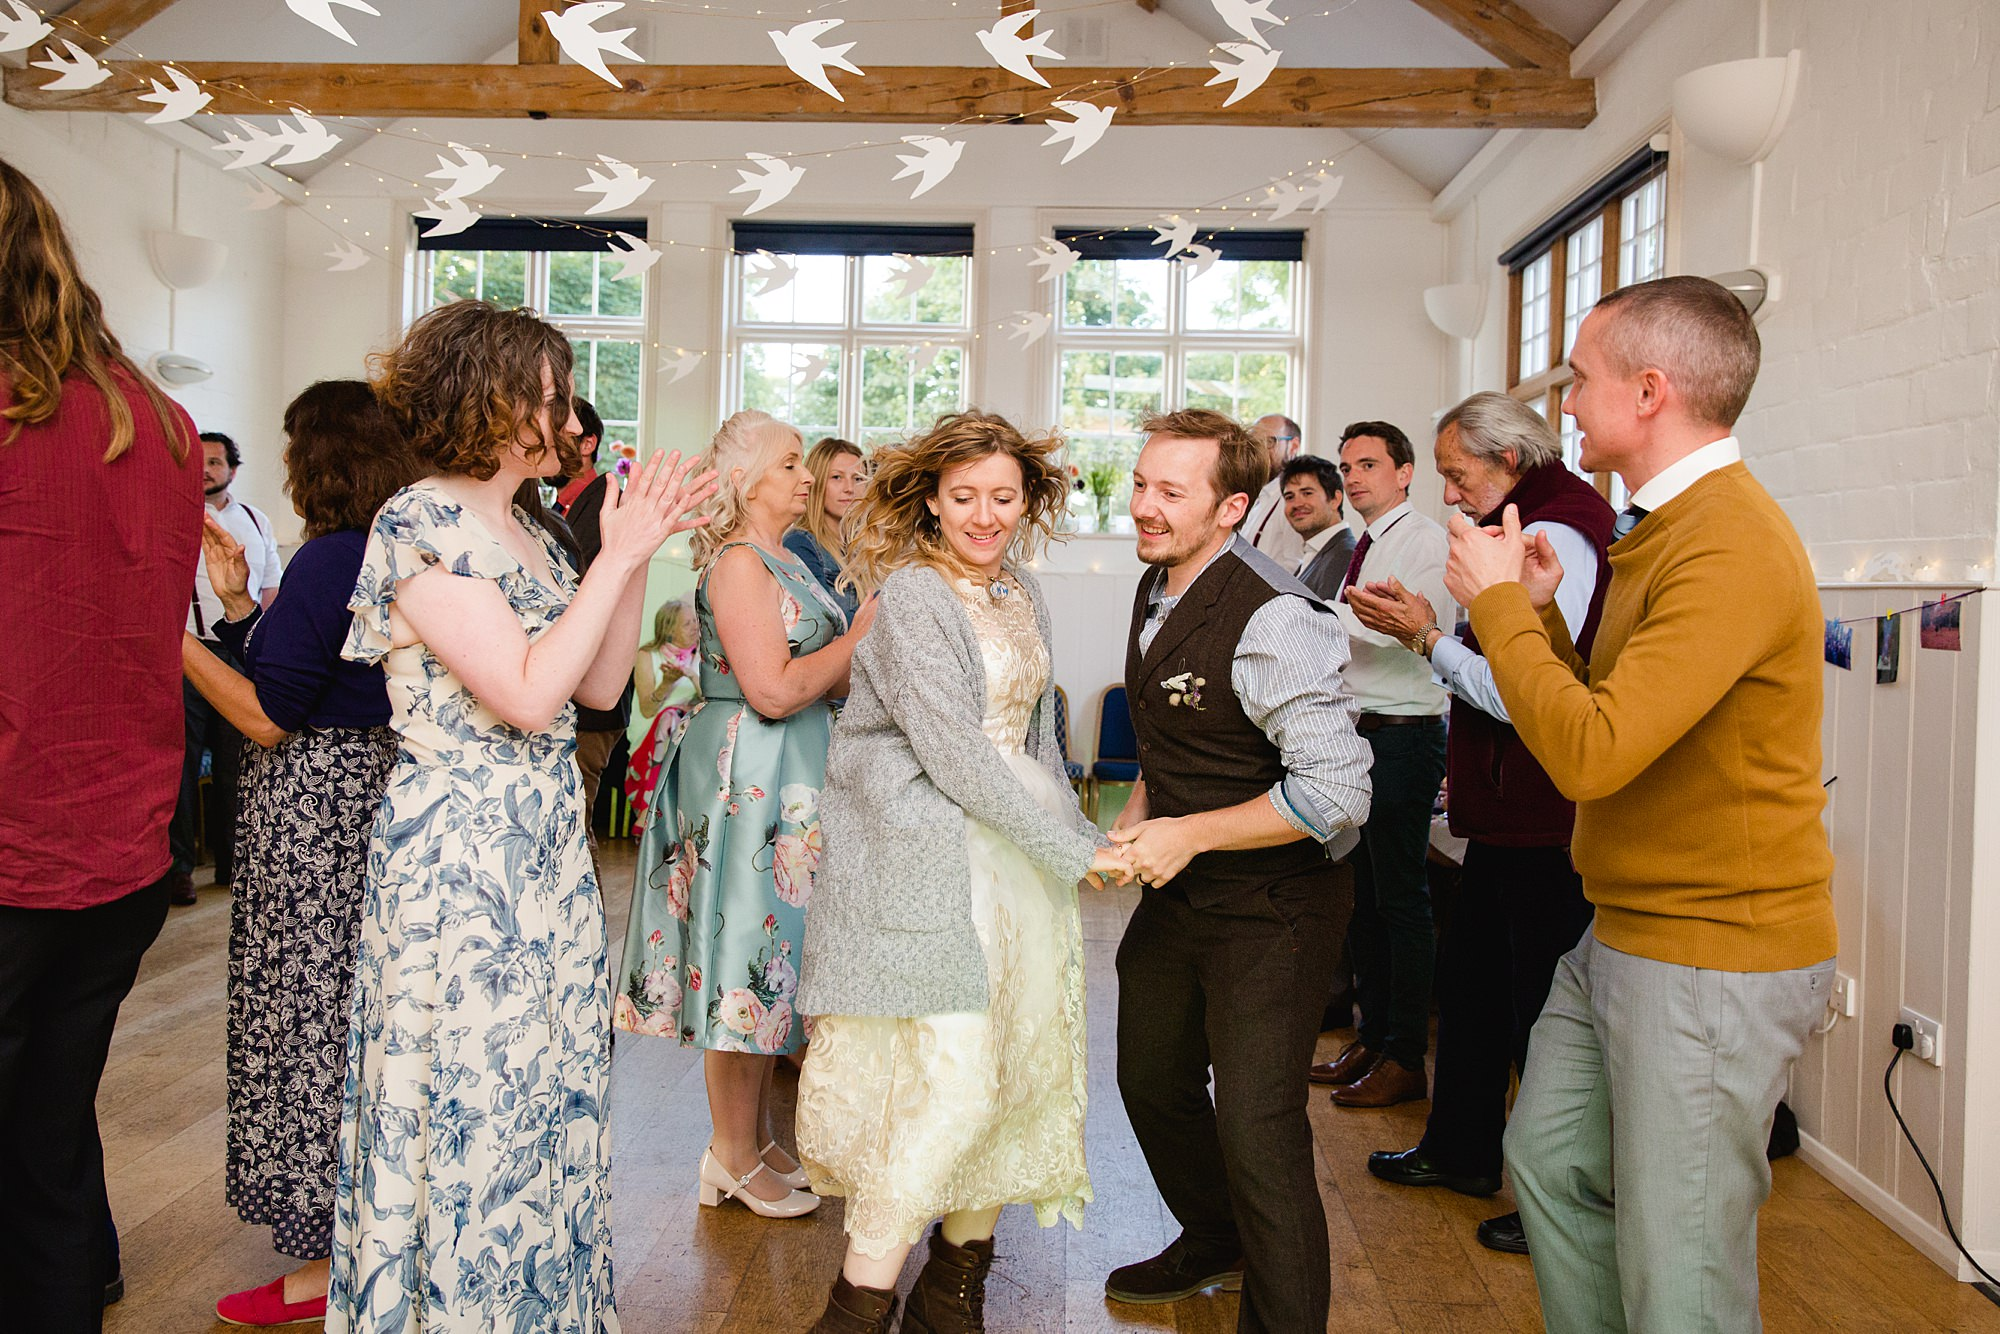 Fun village hall wedding ceilidh dancing